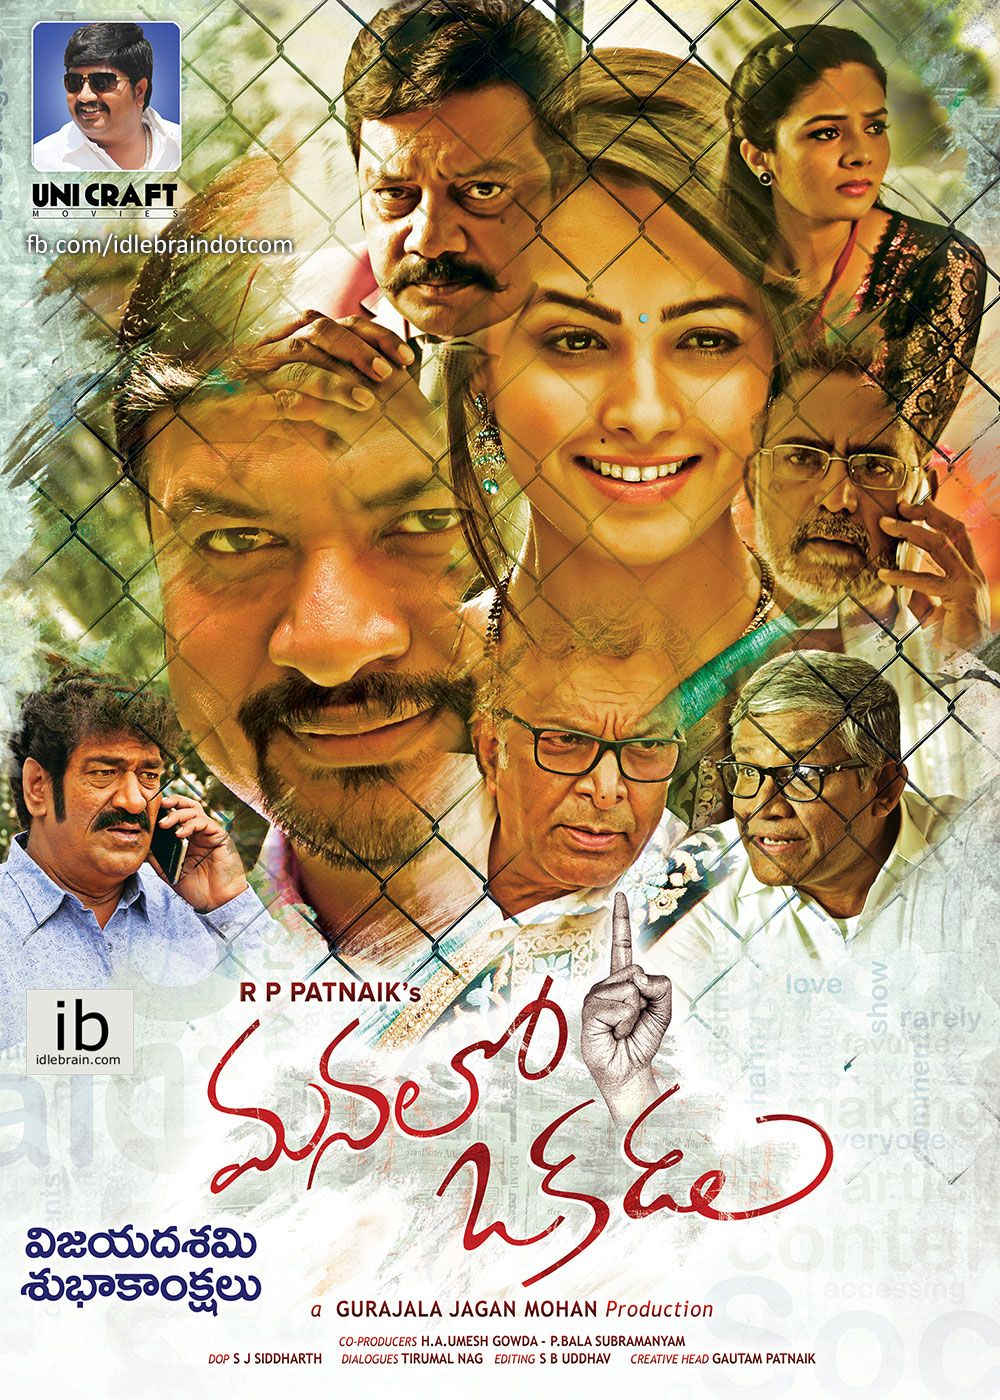 Manalo Okadu Dasara Poster Http Www Idlebrain Com News Today Poster Manalookadu Html Full Movies Bollywood Movies Online Watches Online